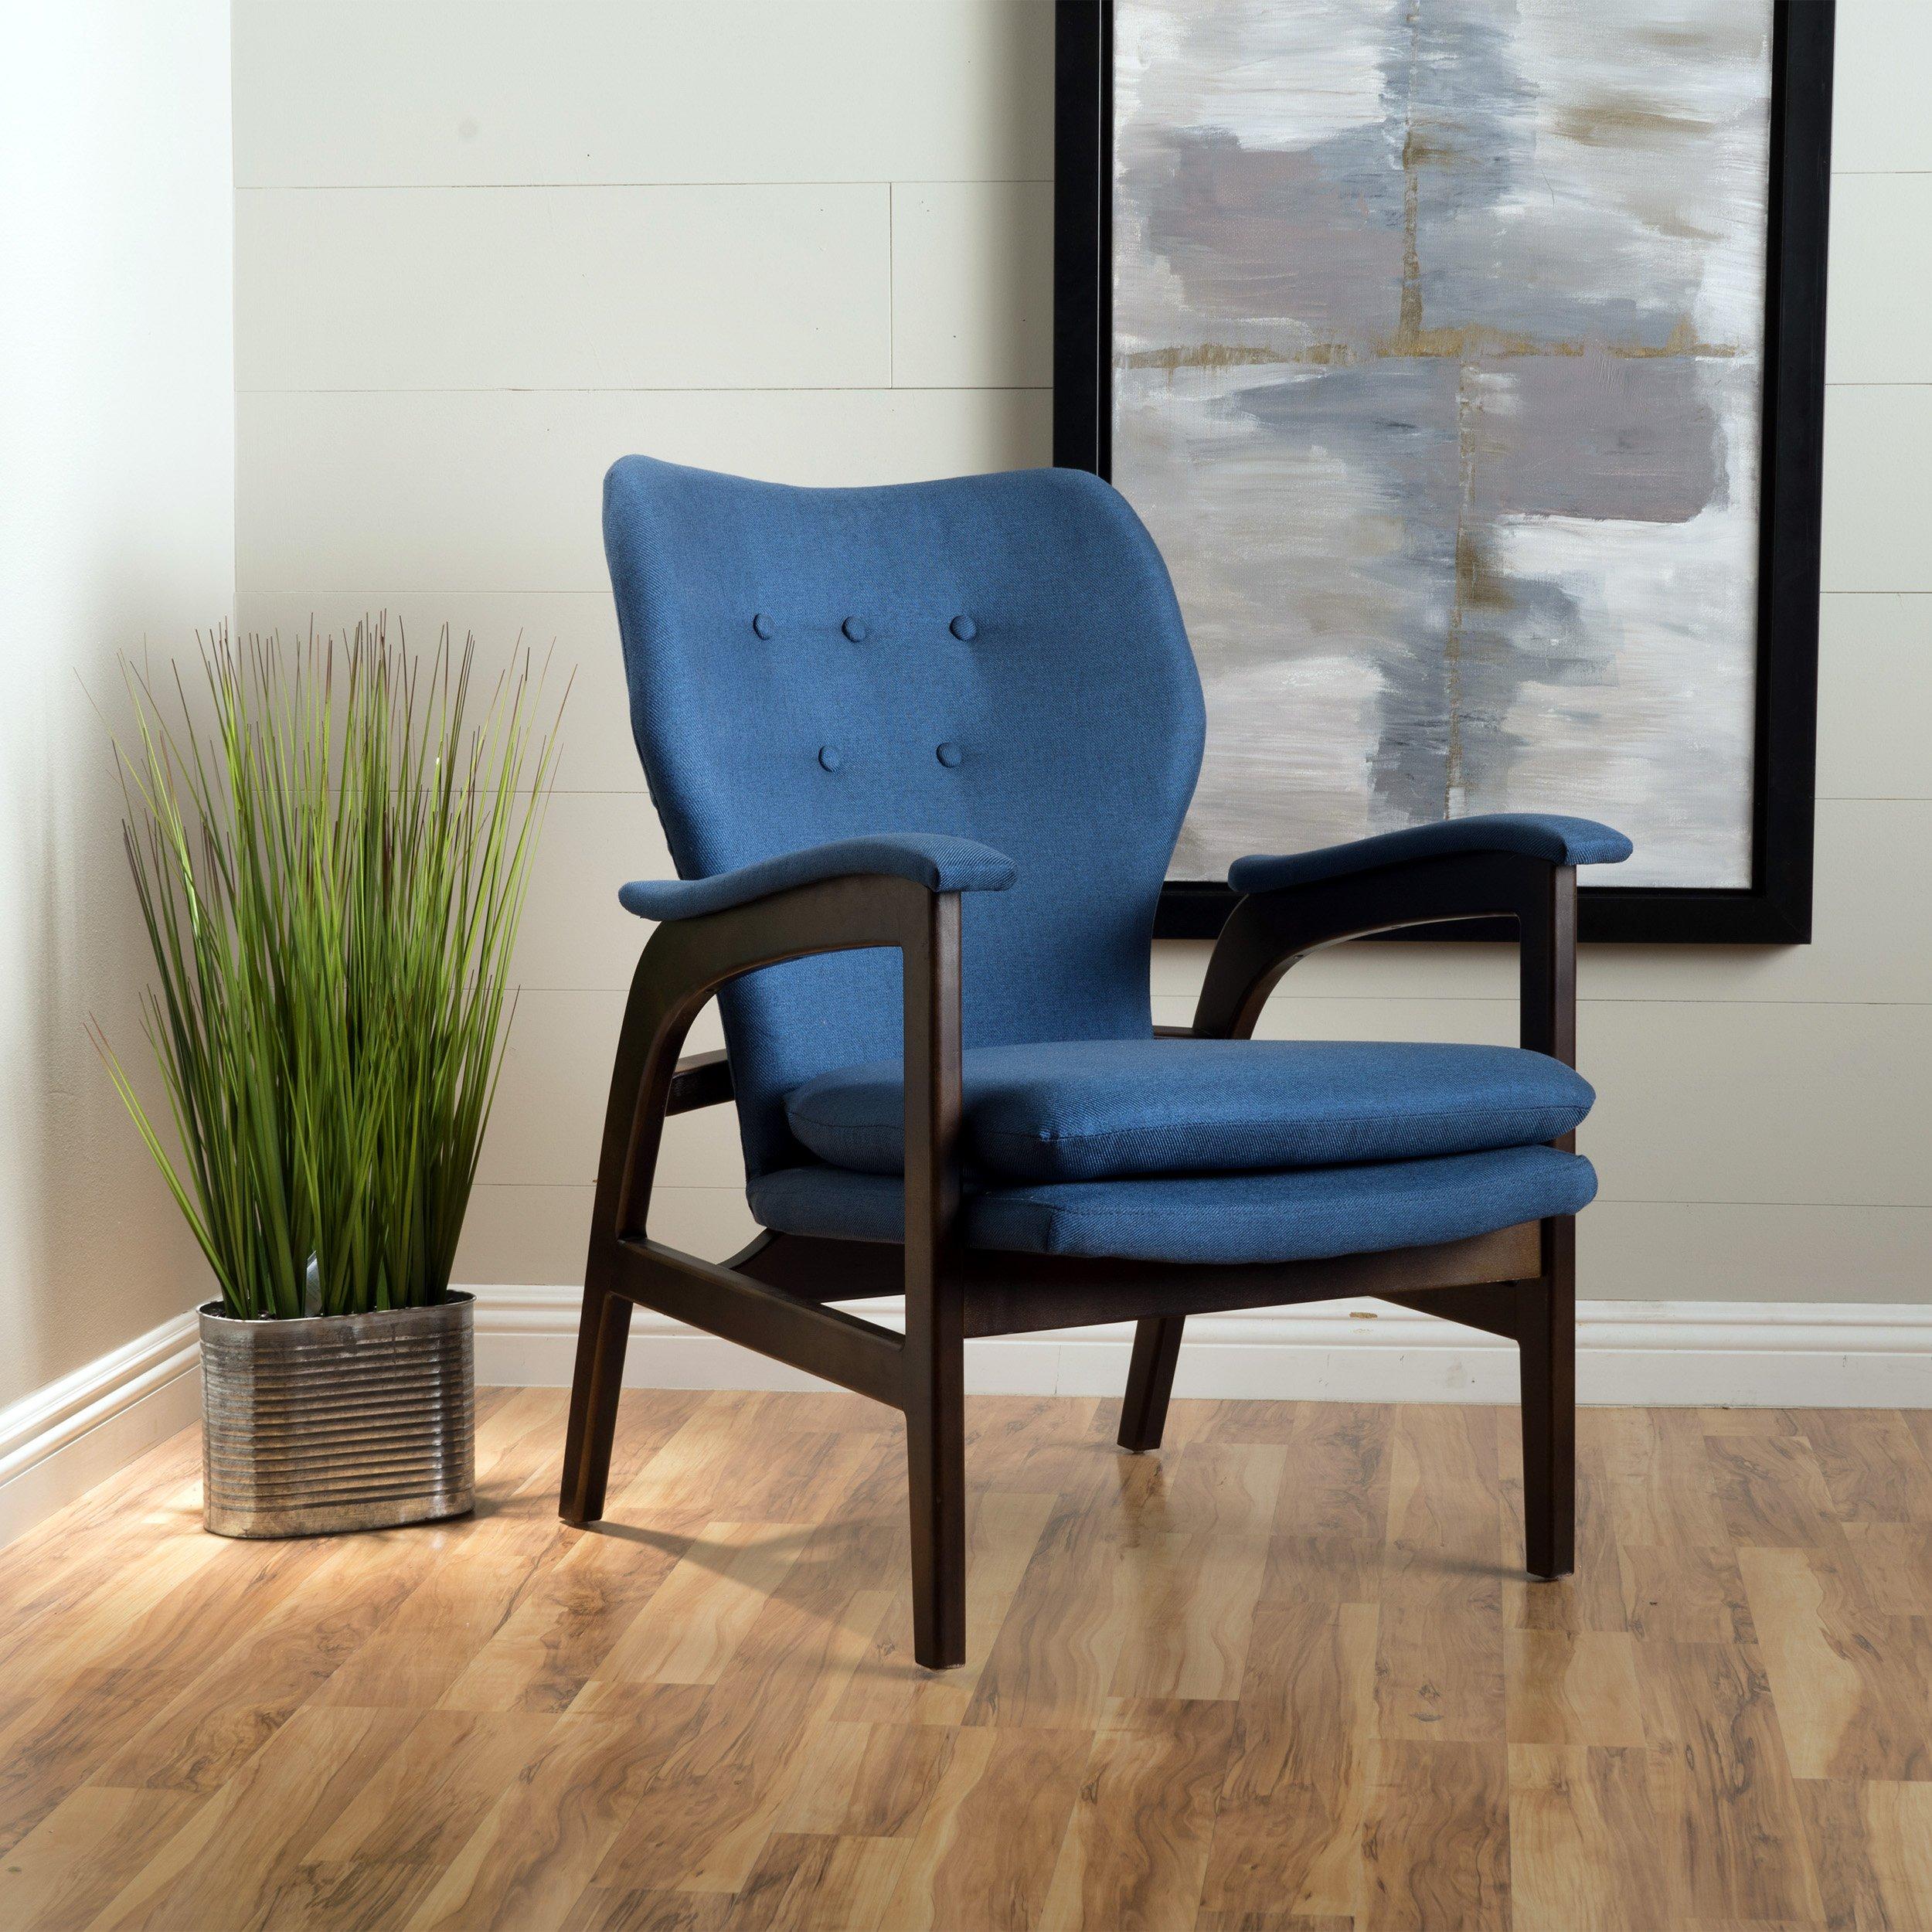 Christopher Knight Home 299413 Joseph Mid Century Modern Fabric Arm Chair, Dark Navy